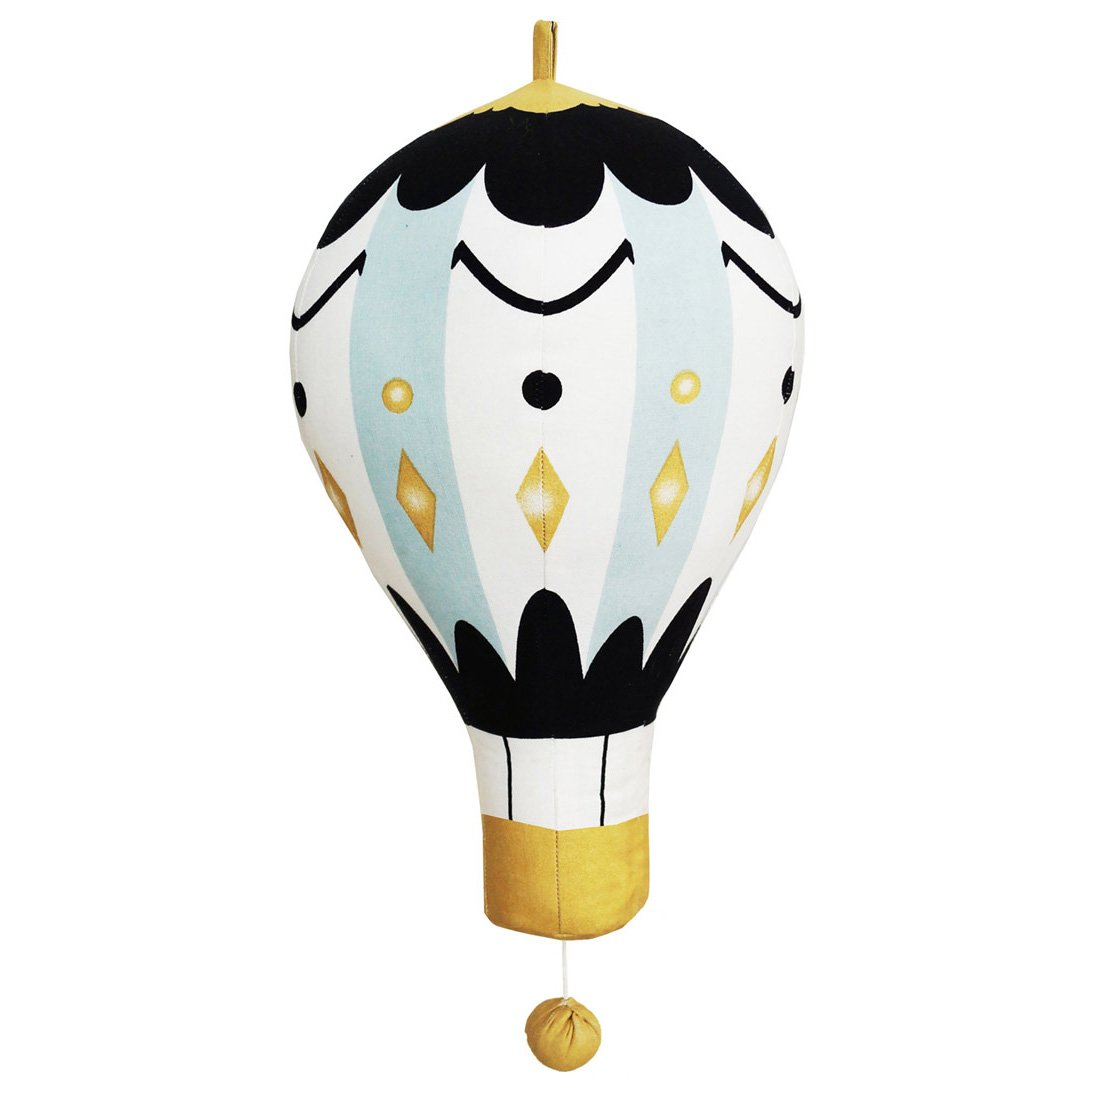 Elodie Details Moon Balloon Musical Toy (Large) ELODIETOYMUSMOONLRG